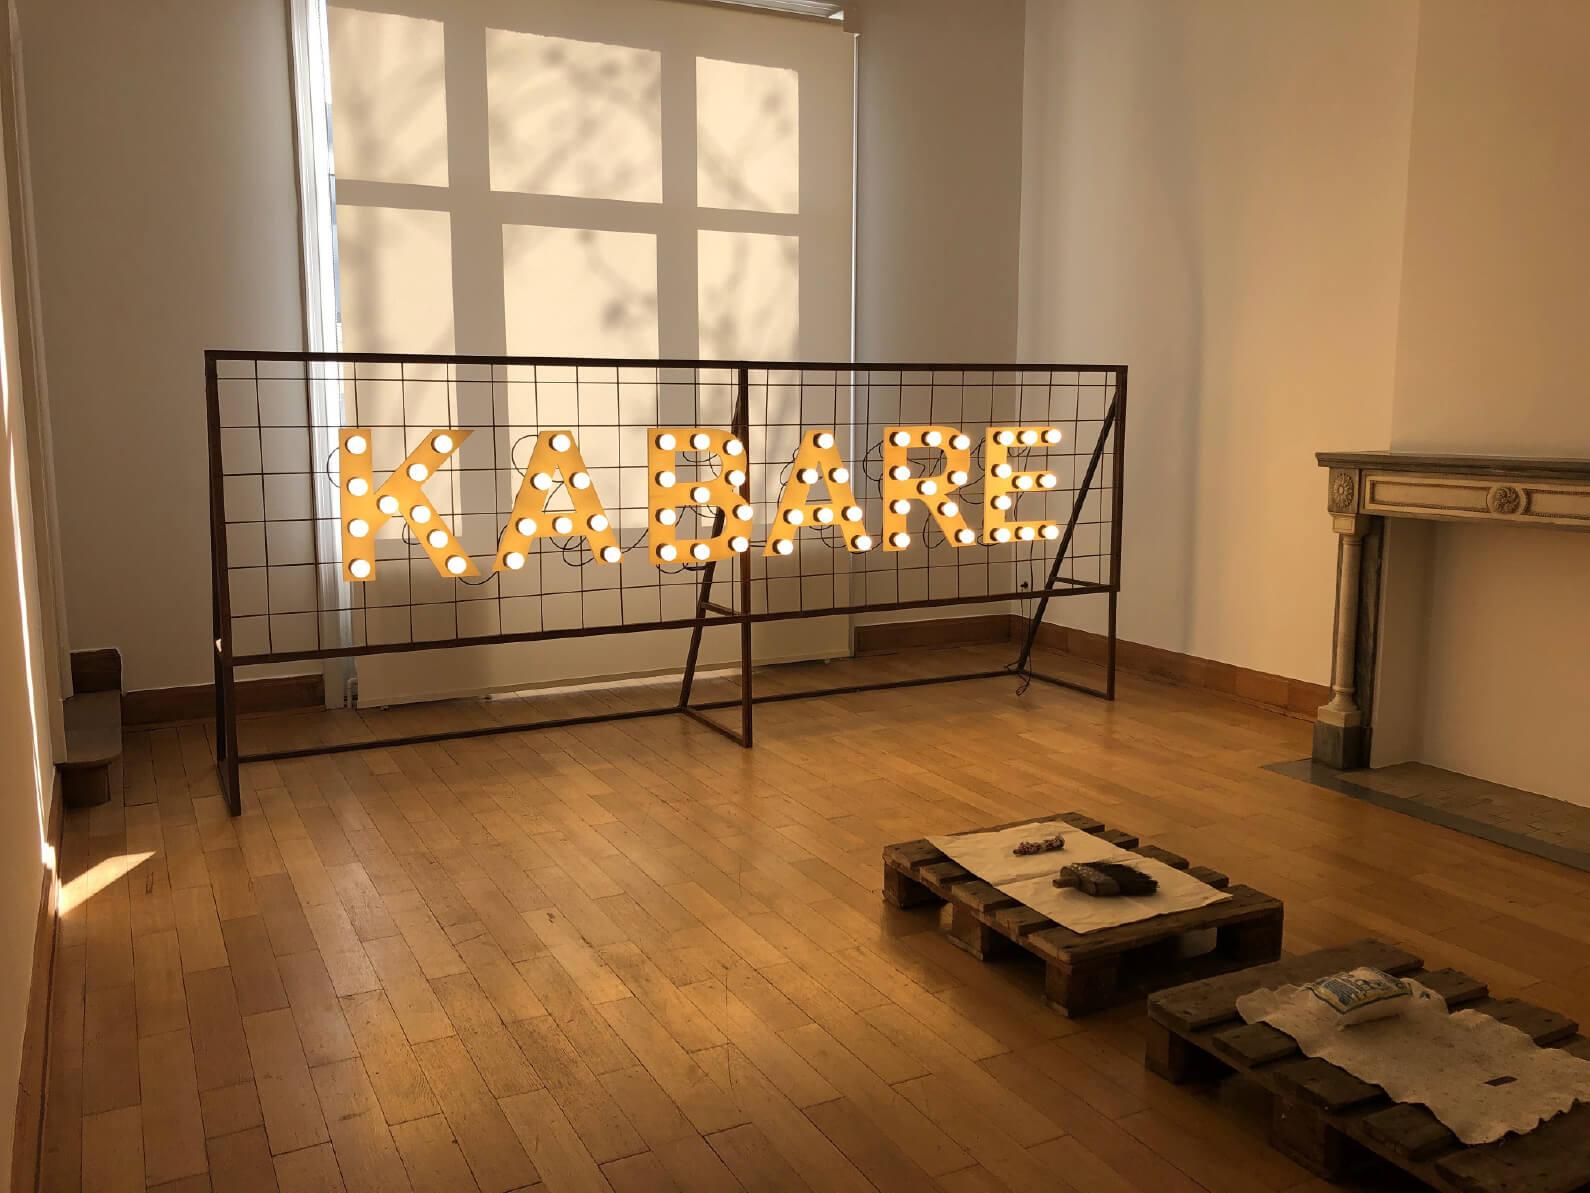 PauloNazareth-fineart-art-artcontemporain-exhibition-gallery-mendeswood-brussels-OKTO-_04 (1)